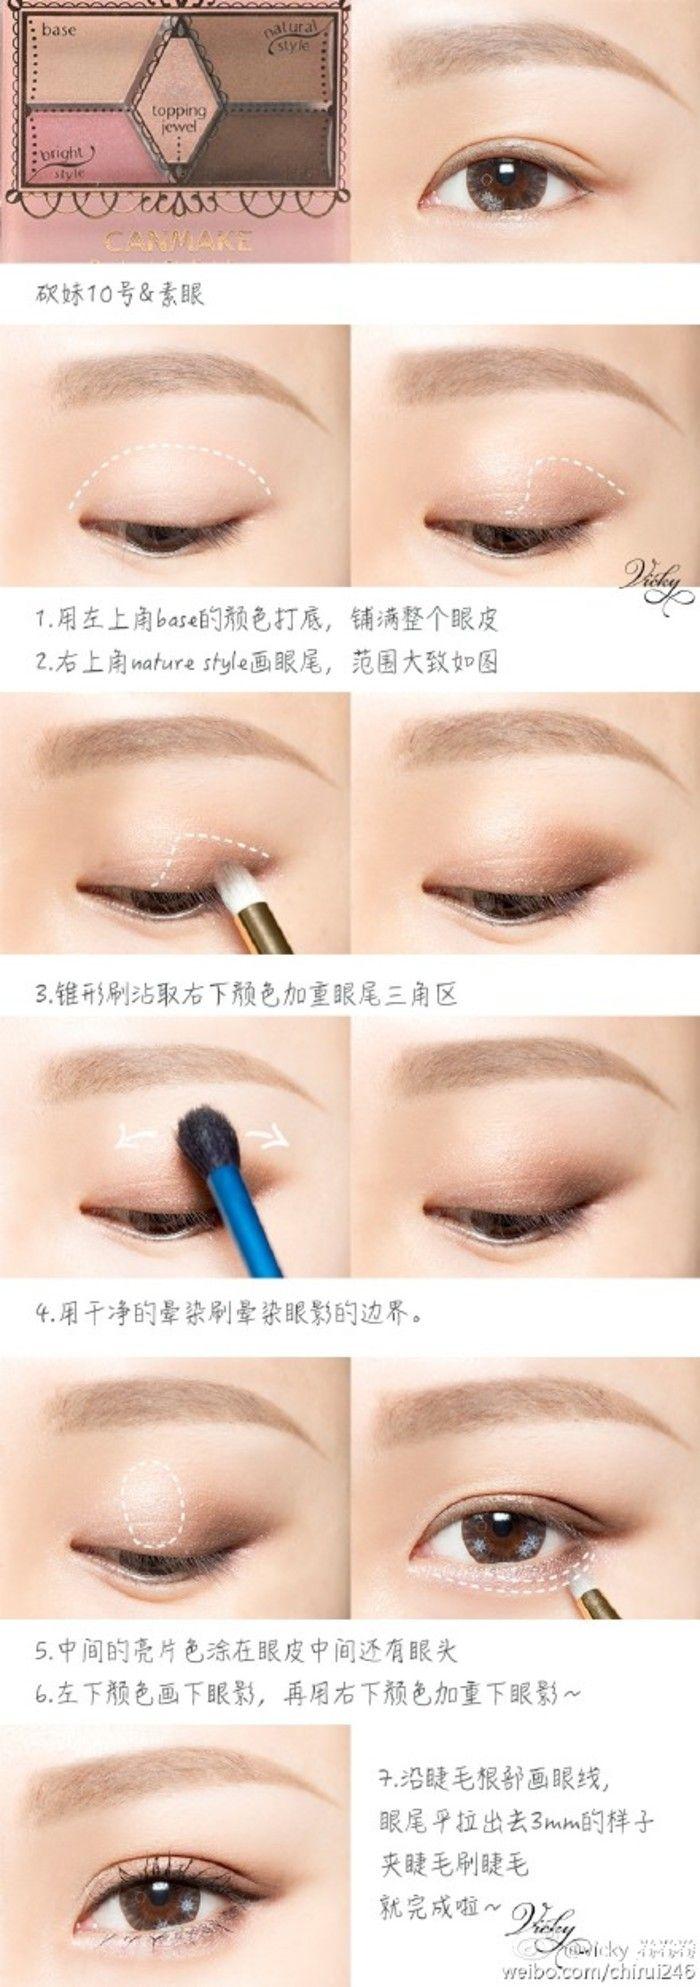 #EyeMakeup #tutorial @stylexpert